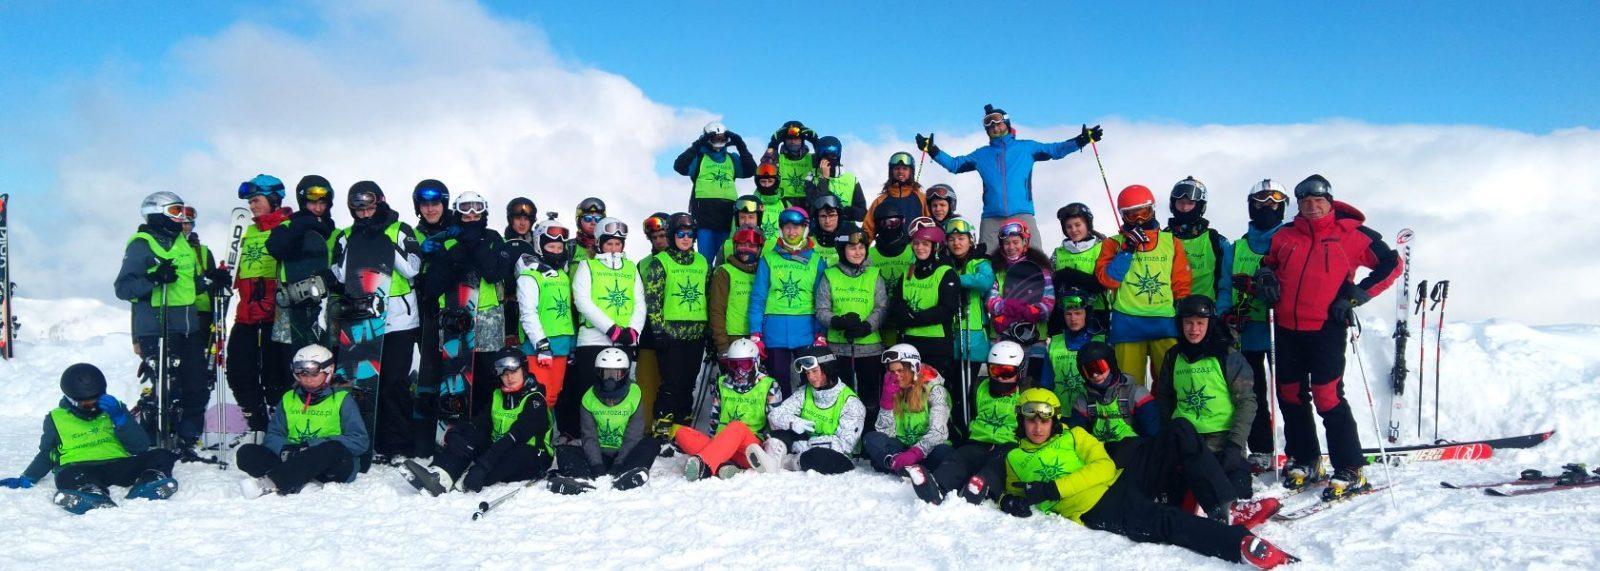 Ski Camp w Austrii 2020<br></noscript><img class=